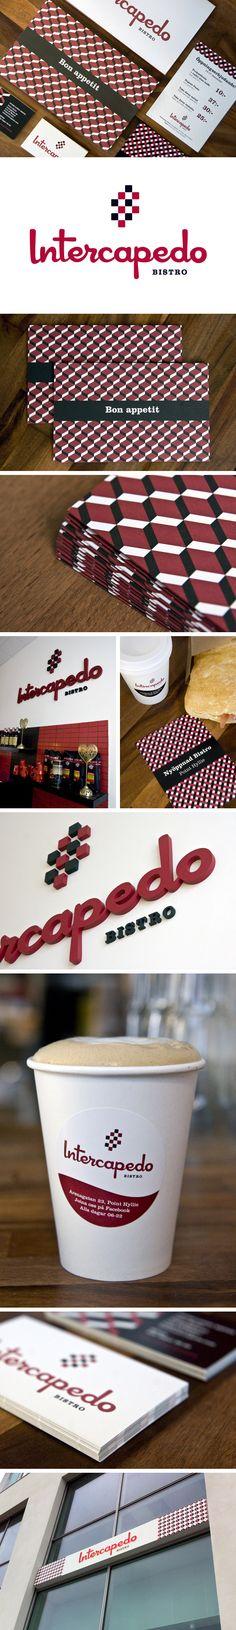 Intercapedo Bistro | #stationary #corporate #design #corporatedesign #logo #identity #branding #marketing <<< repinned by an #advertising agency from #Hamburg / #Germany - www.BlickeDeeler.de | Follow us on www.facebook.com/BlickeDeeler